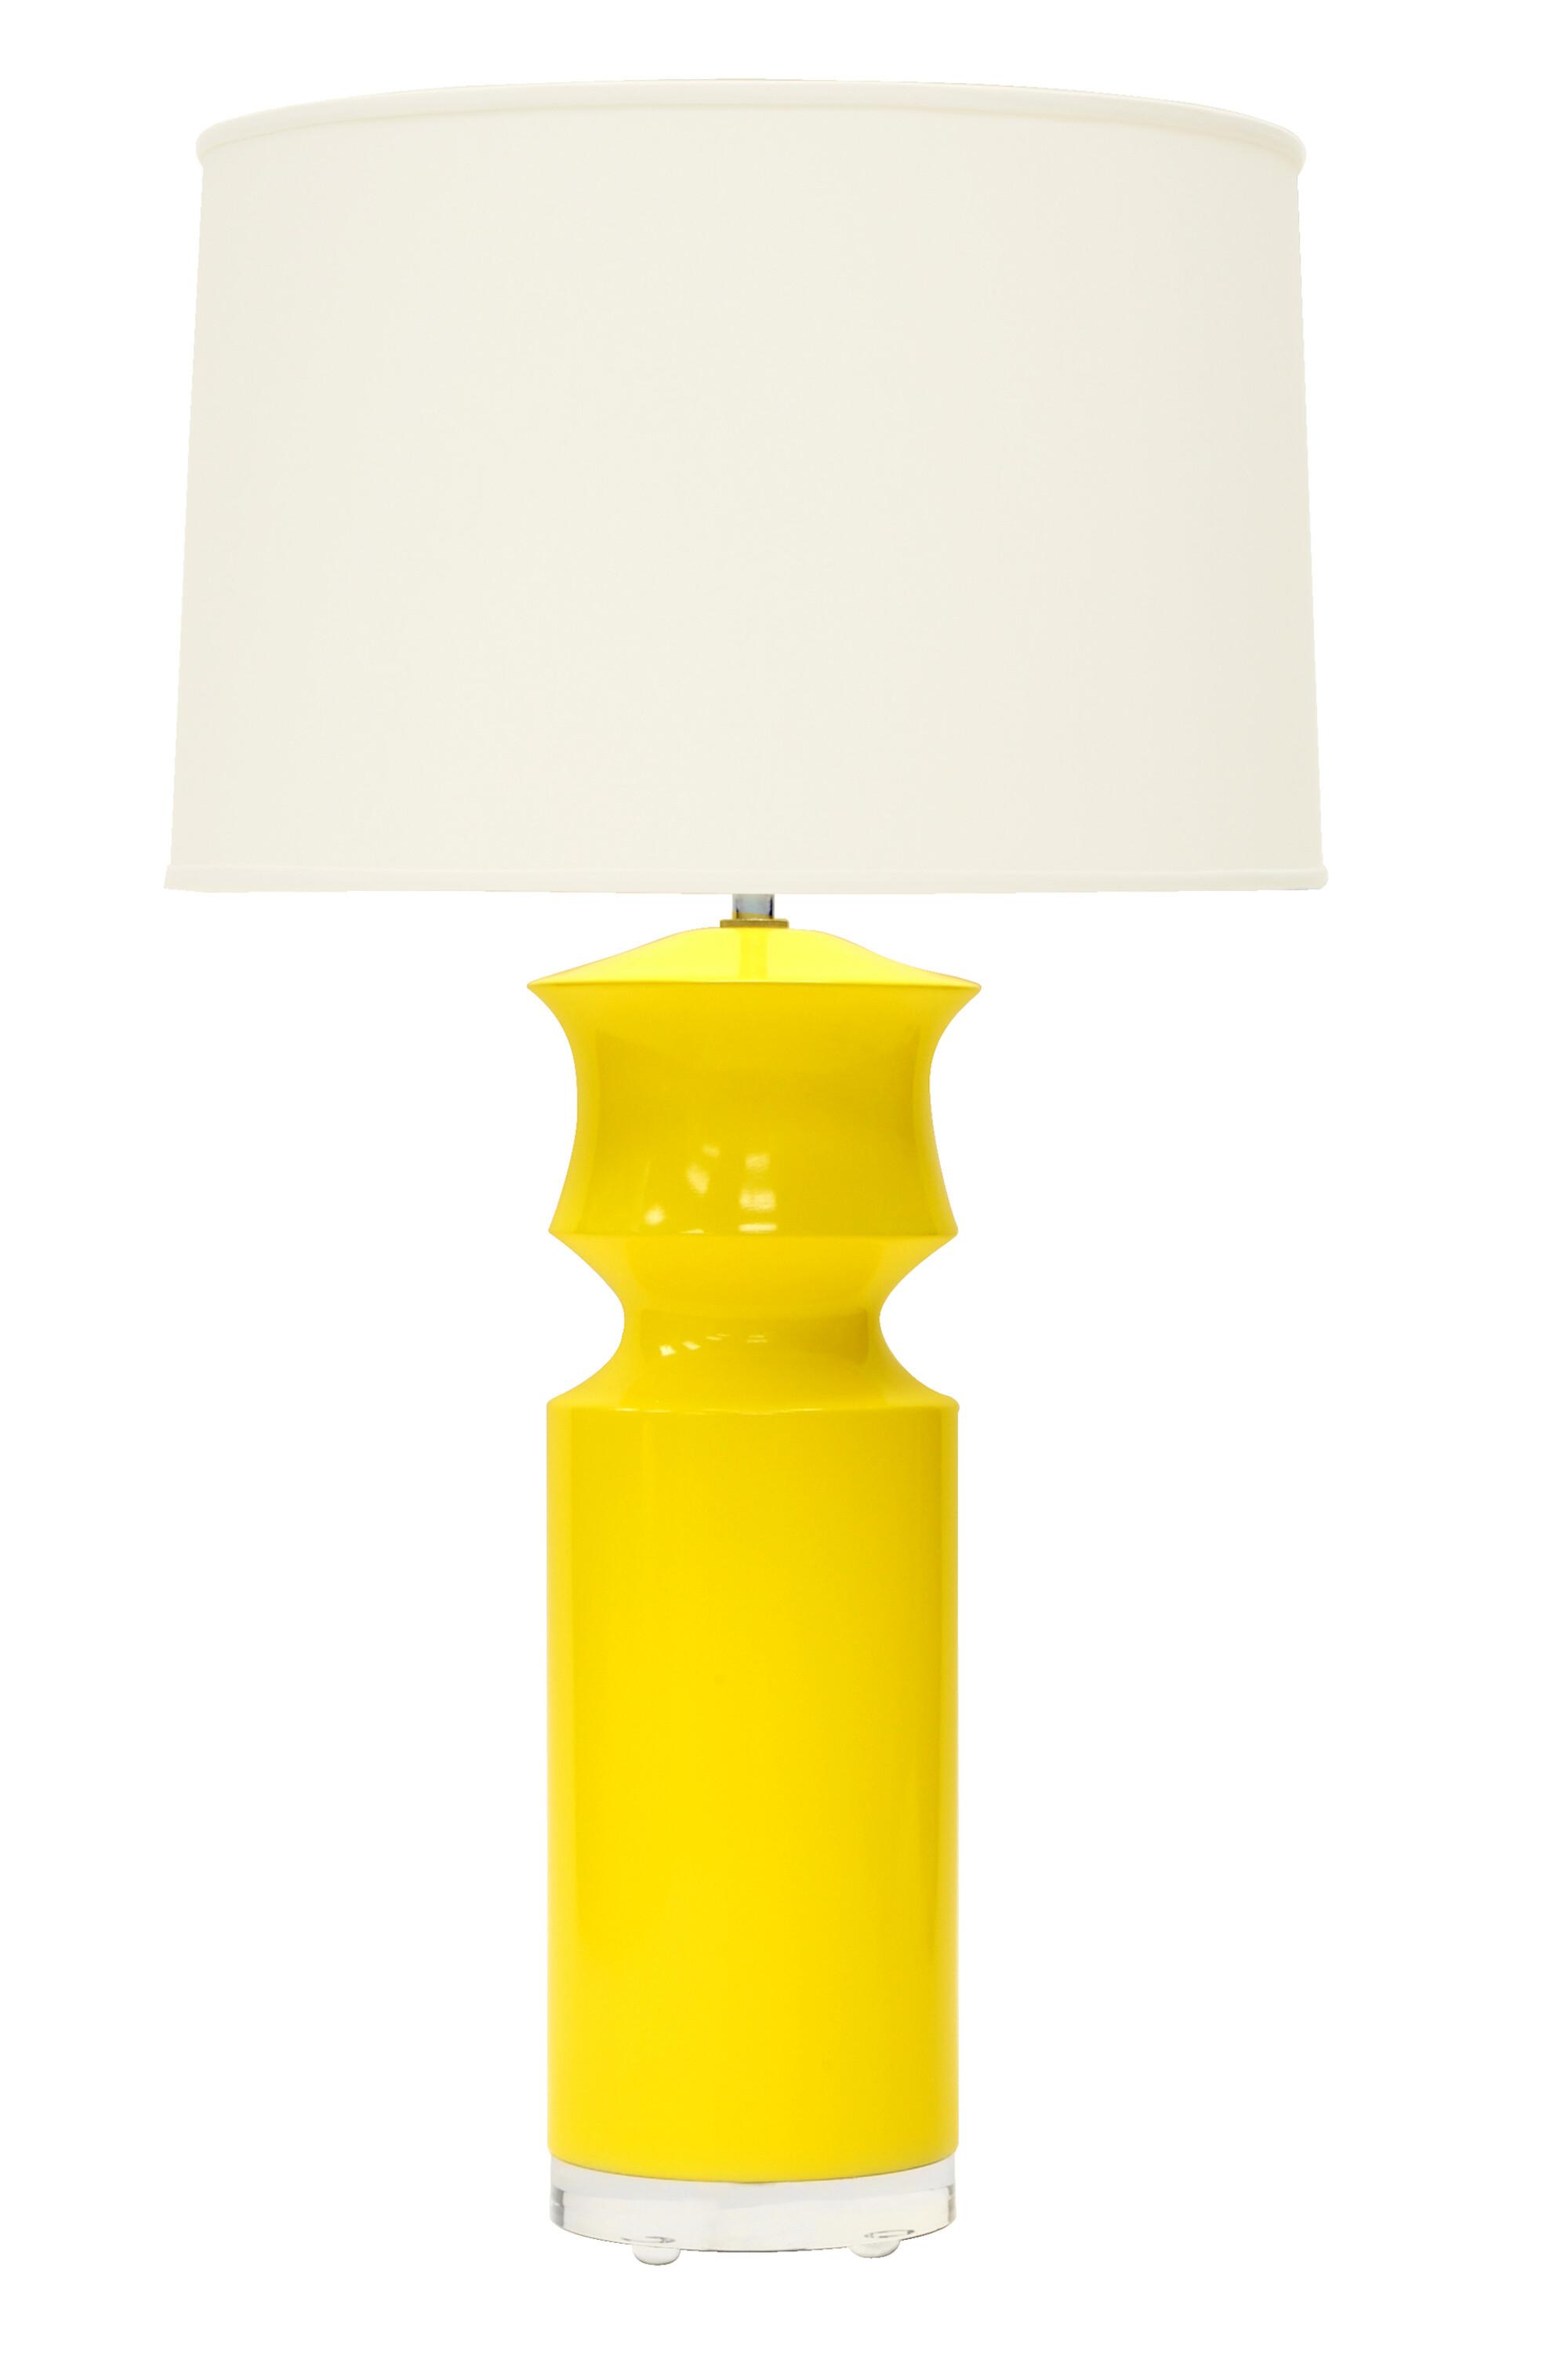 DUKE TABLE LAMP